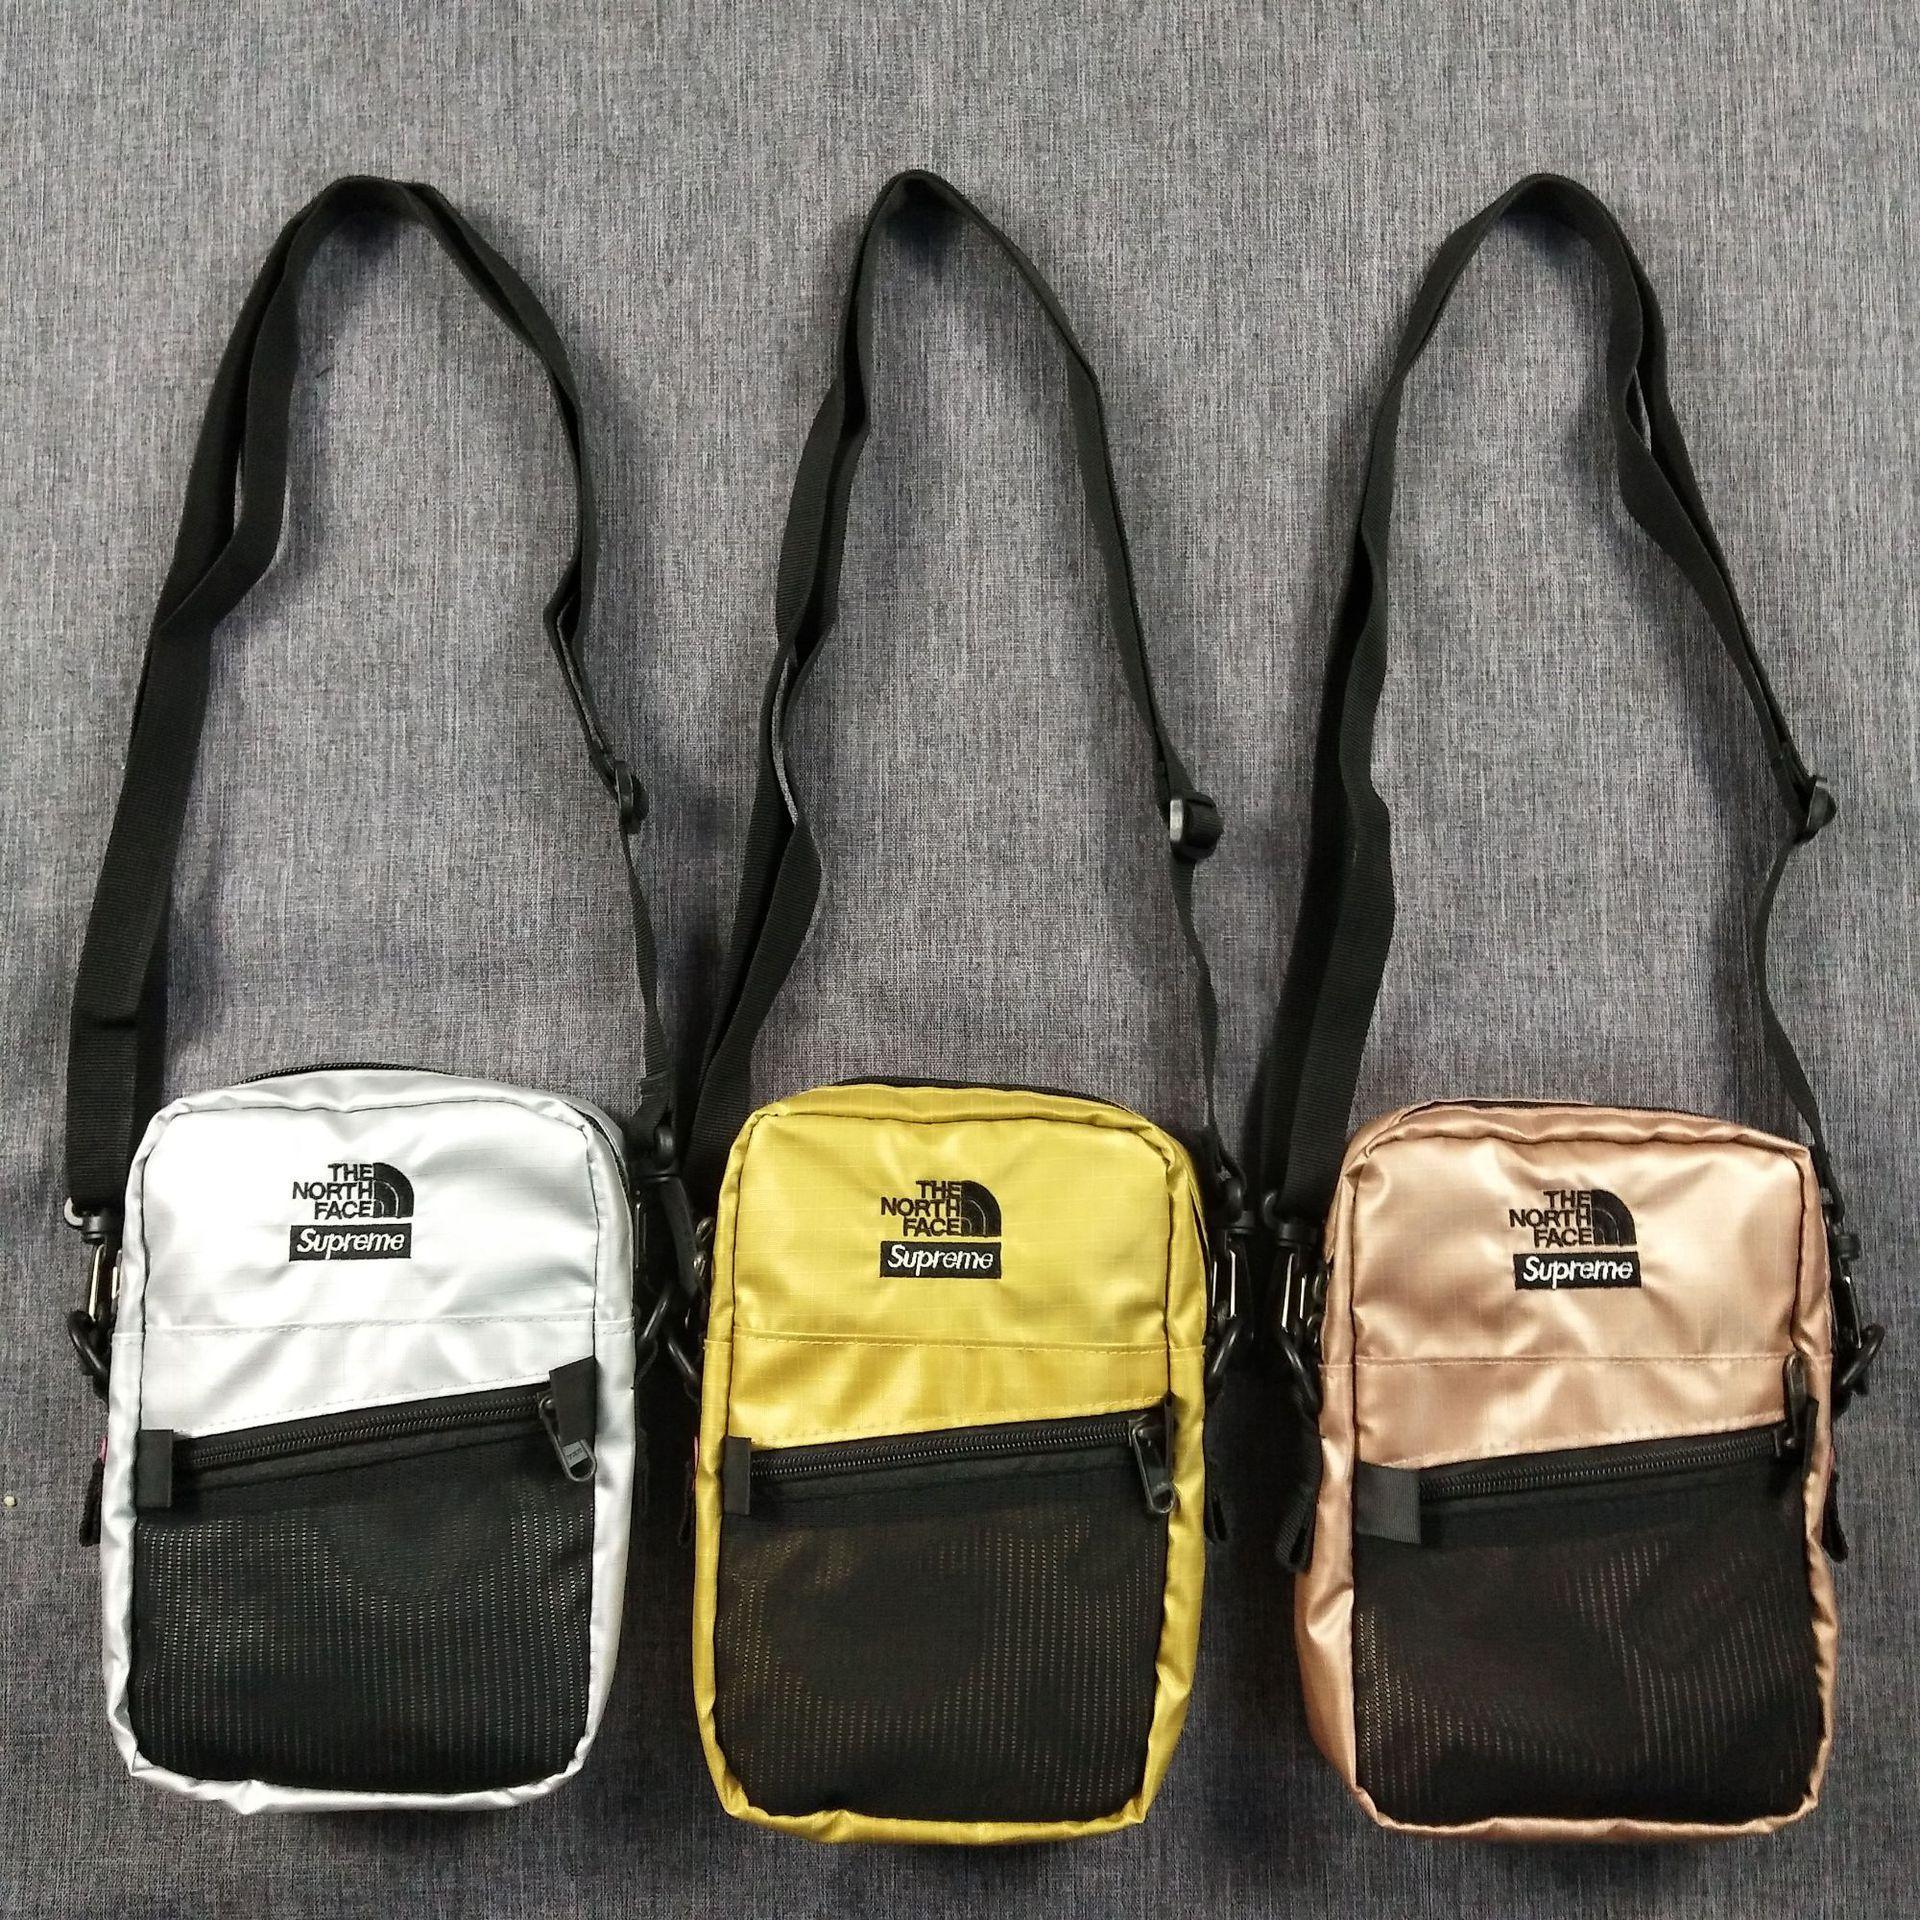 Supreme-x-The-North-face-metallic-gold-shoulder-bag     Supreme-x-The-North-face-metallic-gold-shoulder-bag  Details about  Supreme x The North face metallic gold shoulder bag